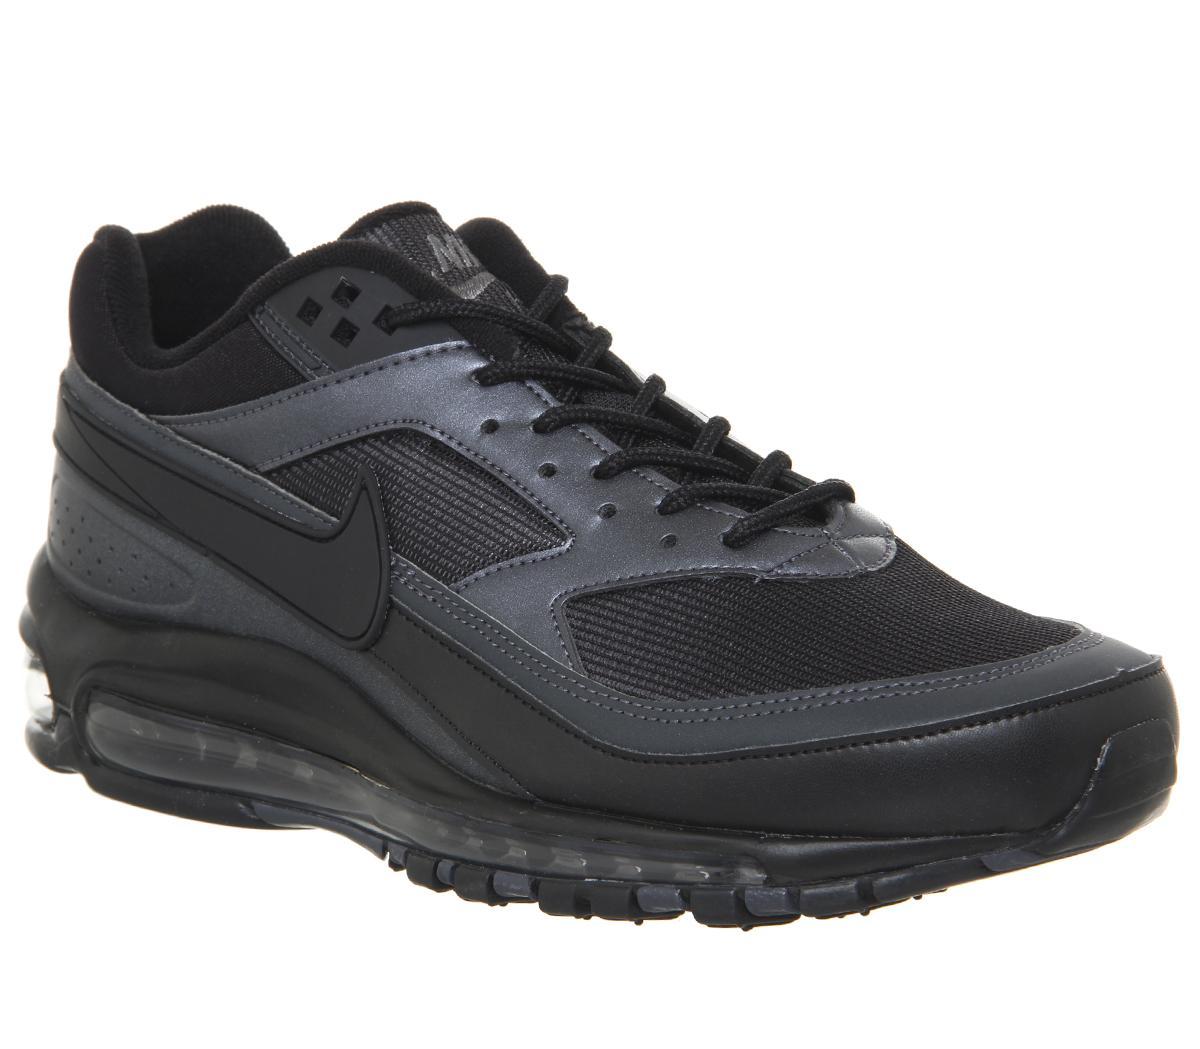 Nike Air Max 97 Metallic Hematite